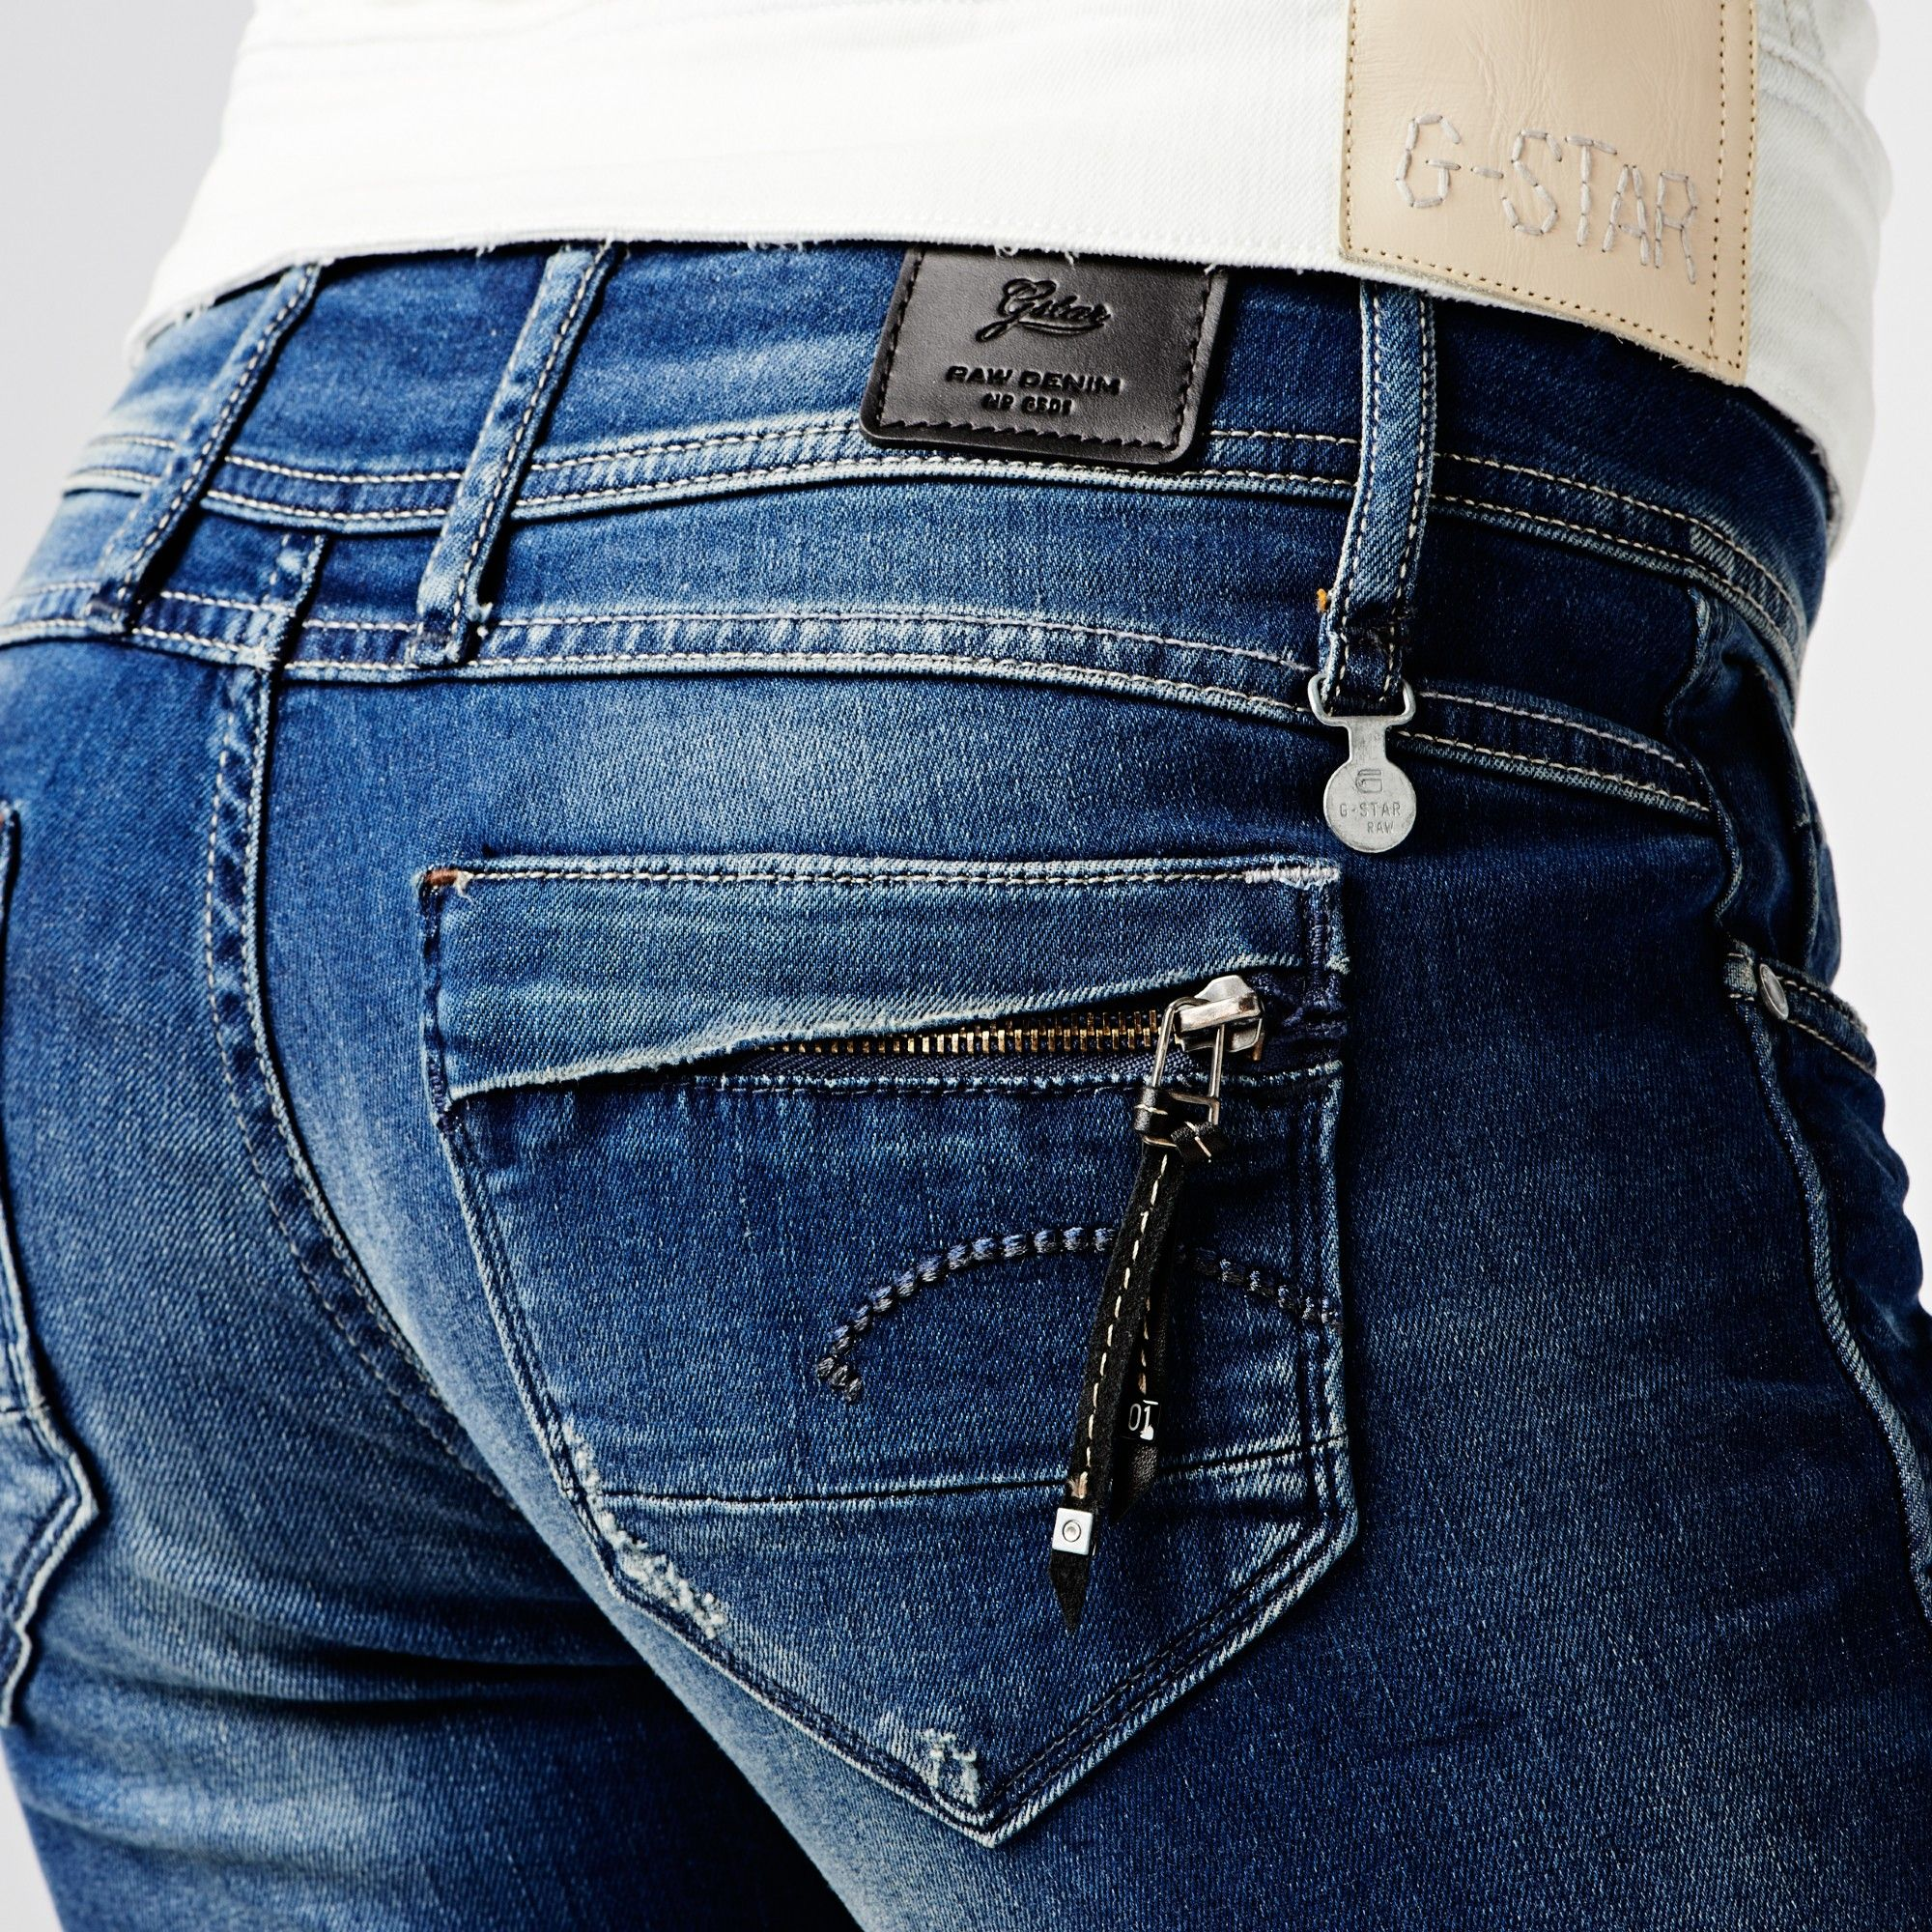 star raw midge cody skinny women jeans denim jeans details. Black Bedroom Furniture Sets. Home Design Ideas